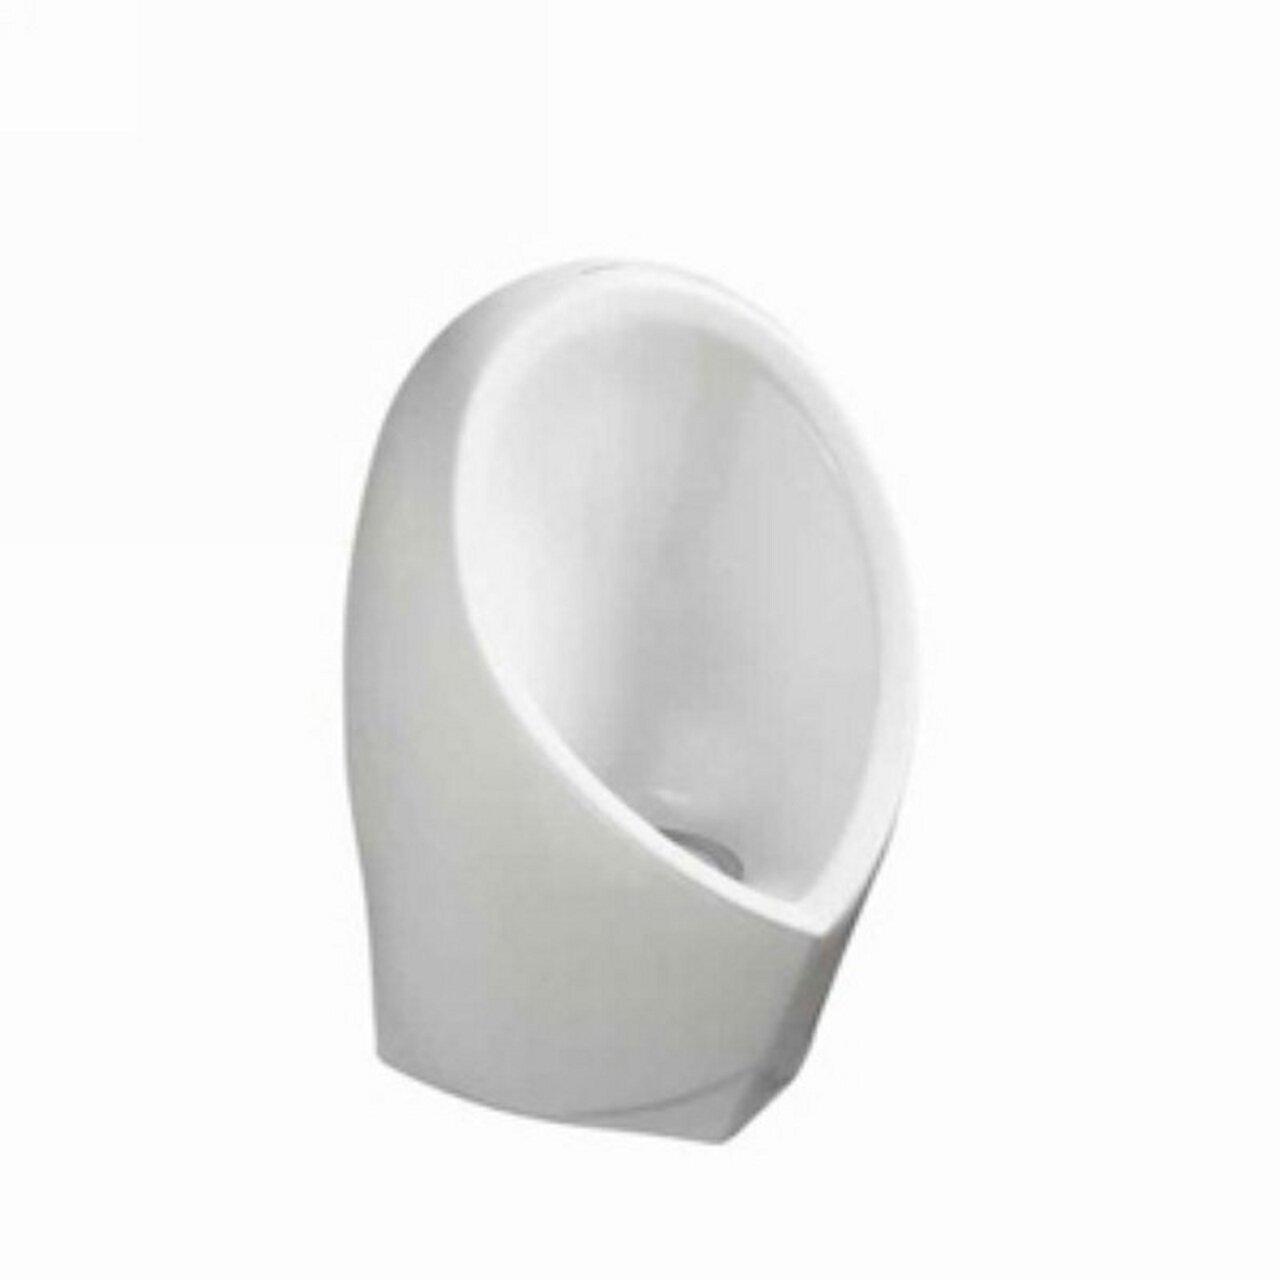 American Standard 6154.100.020 Flowise Flush-Free Medium Waterless Urinal, White